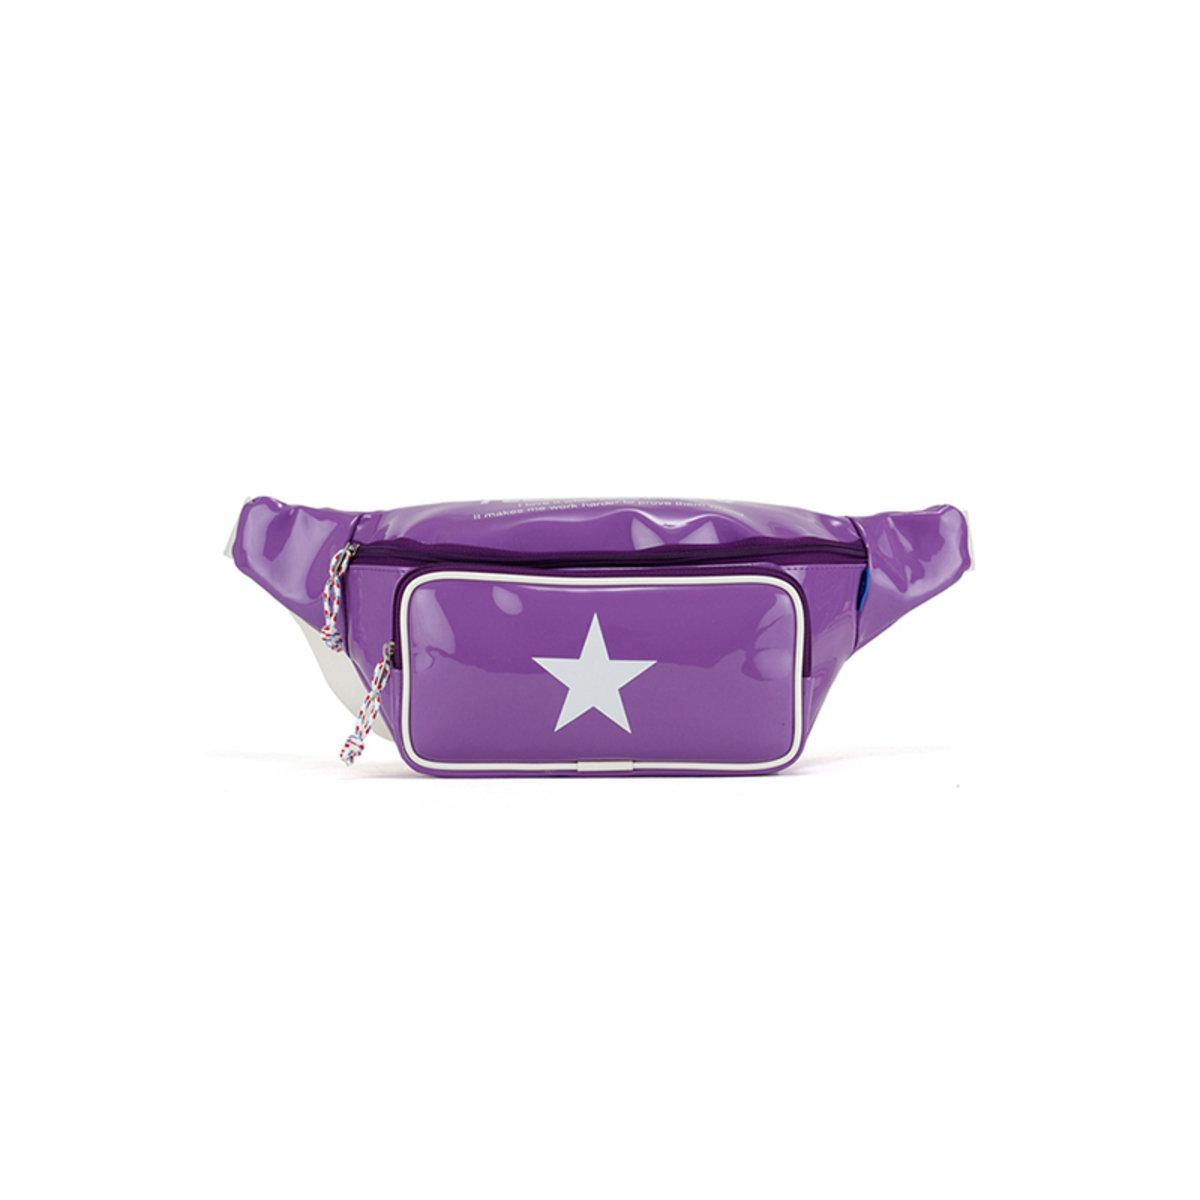 Pop Pop Waist Bag (Violet)